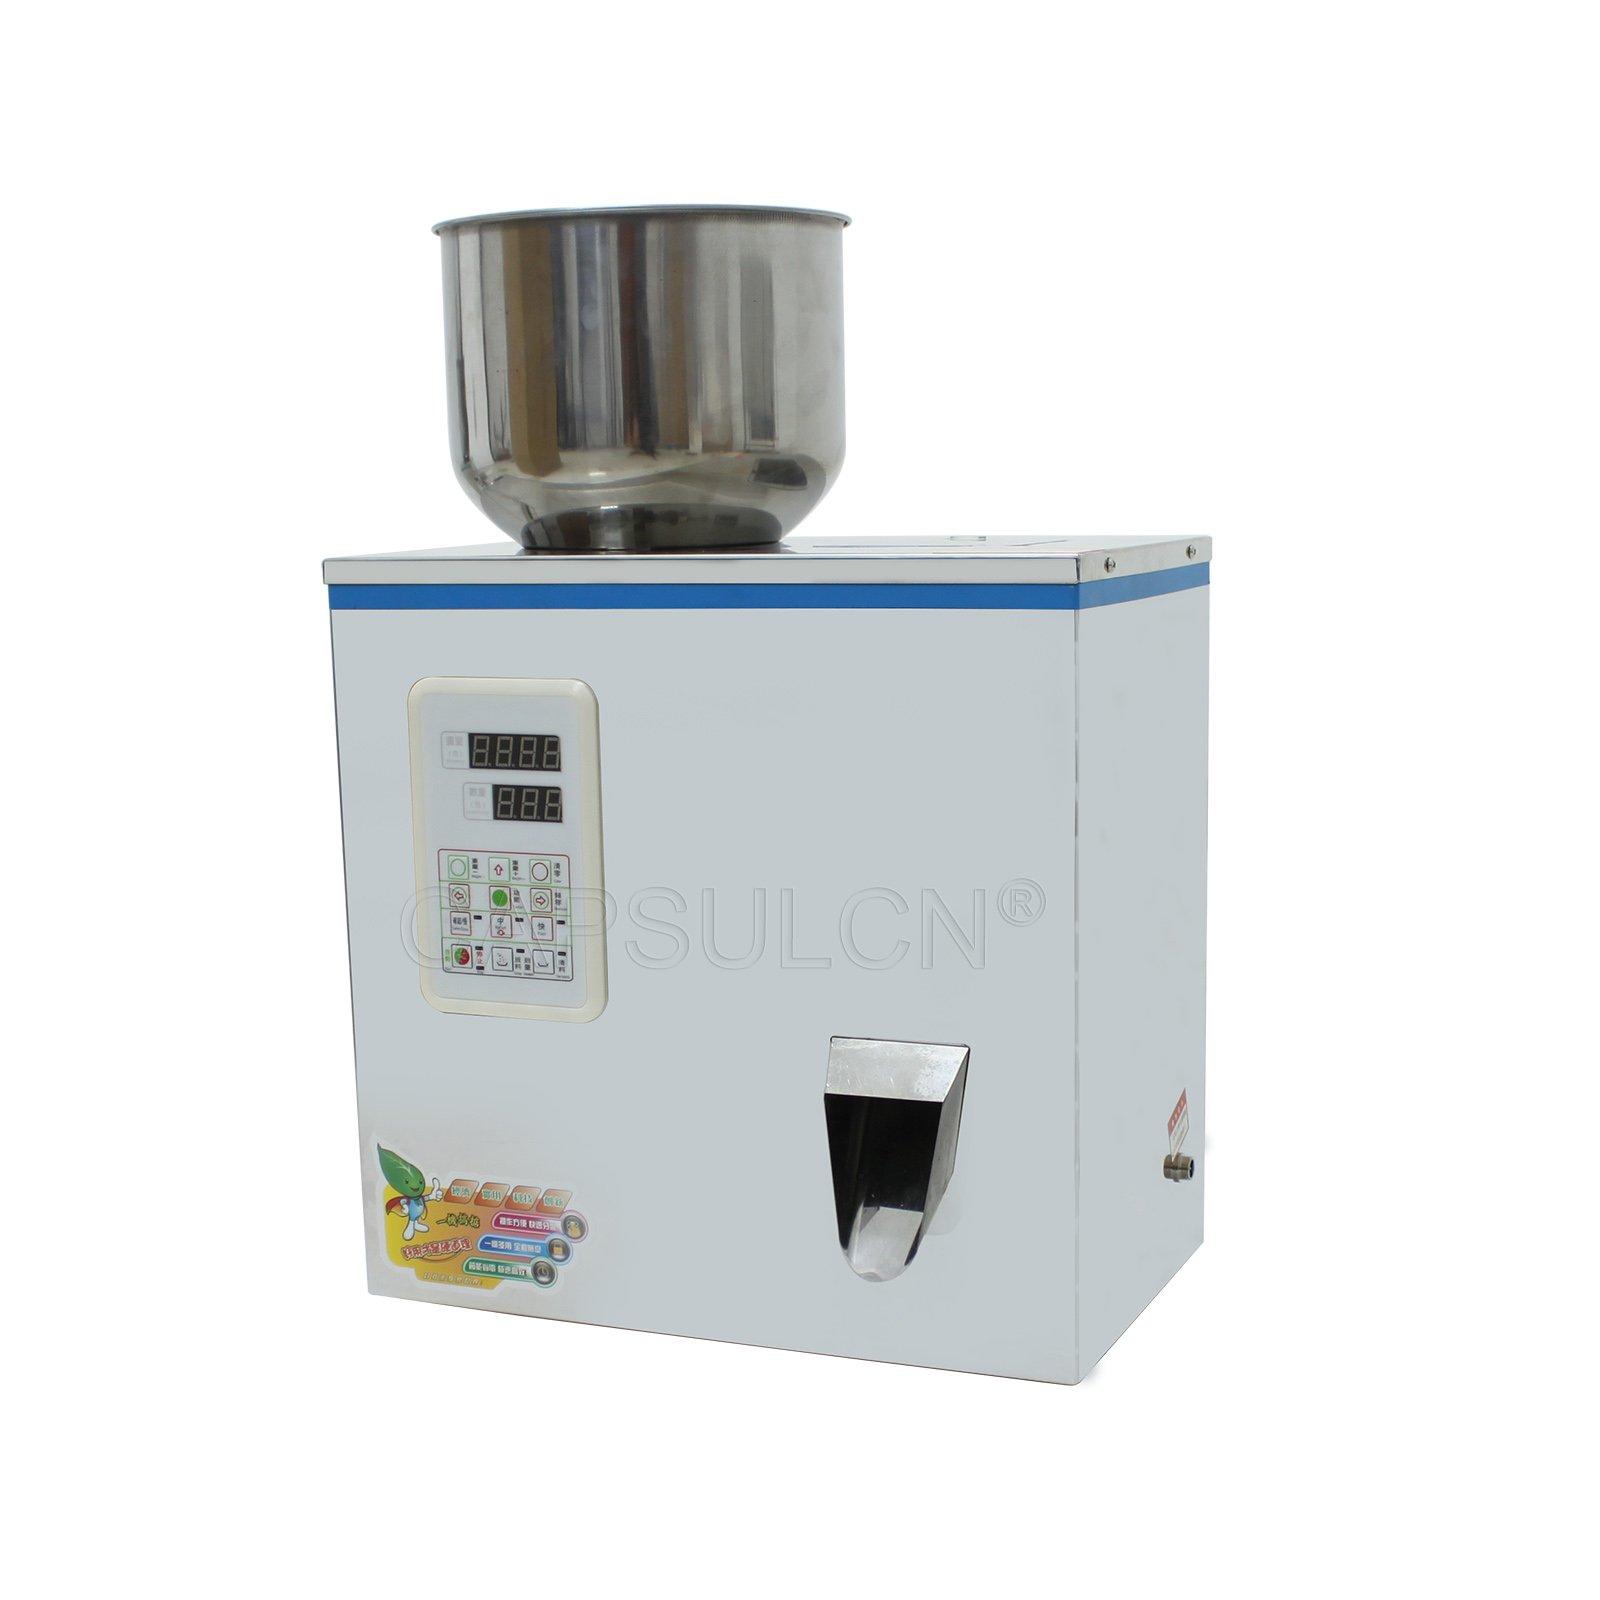 CapsulCN 110V FZZ-1 Auto Weighing and Filling Machine Powder & Granule Dispenser (1-50g)